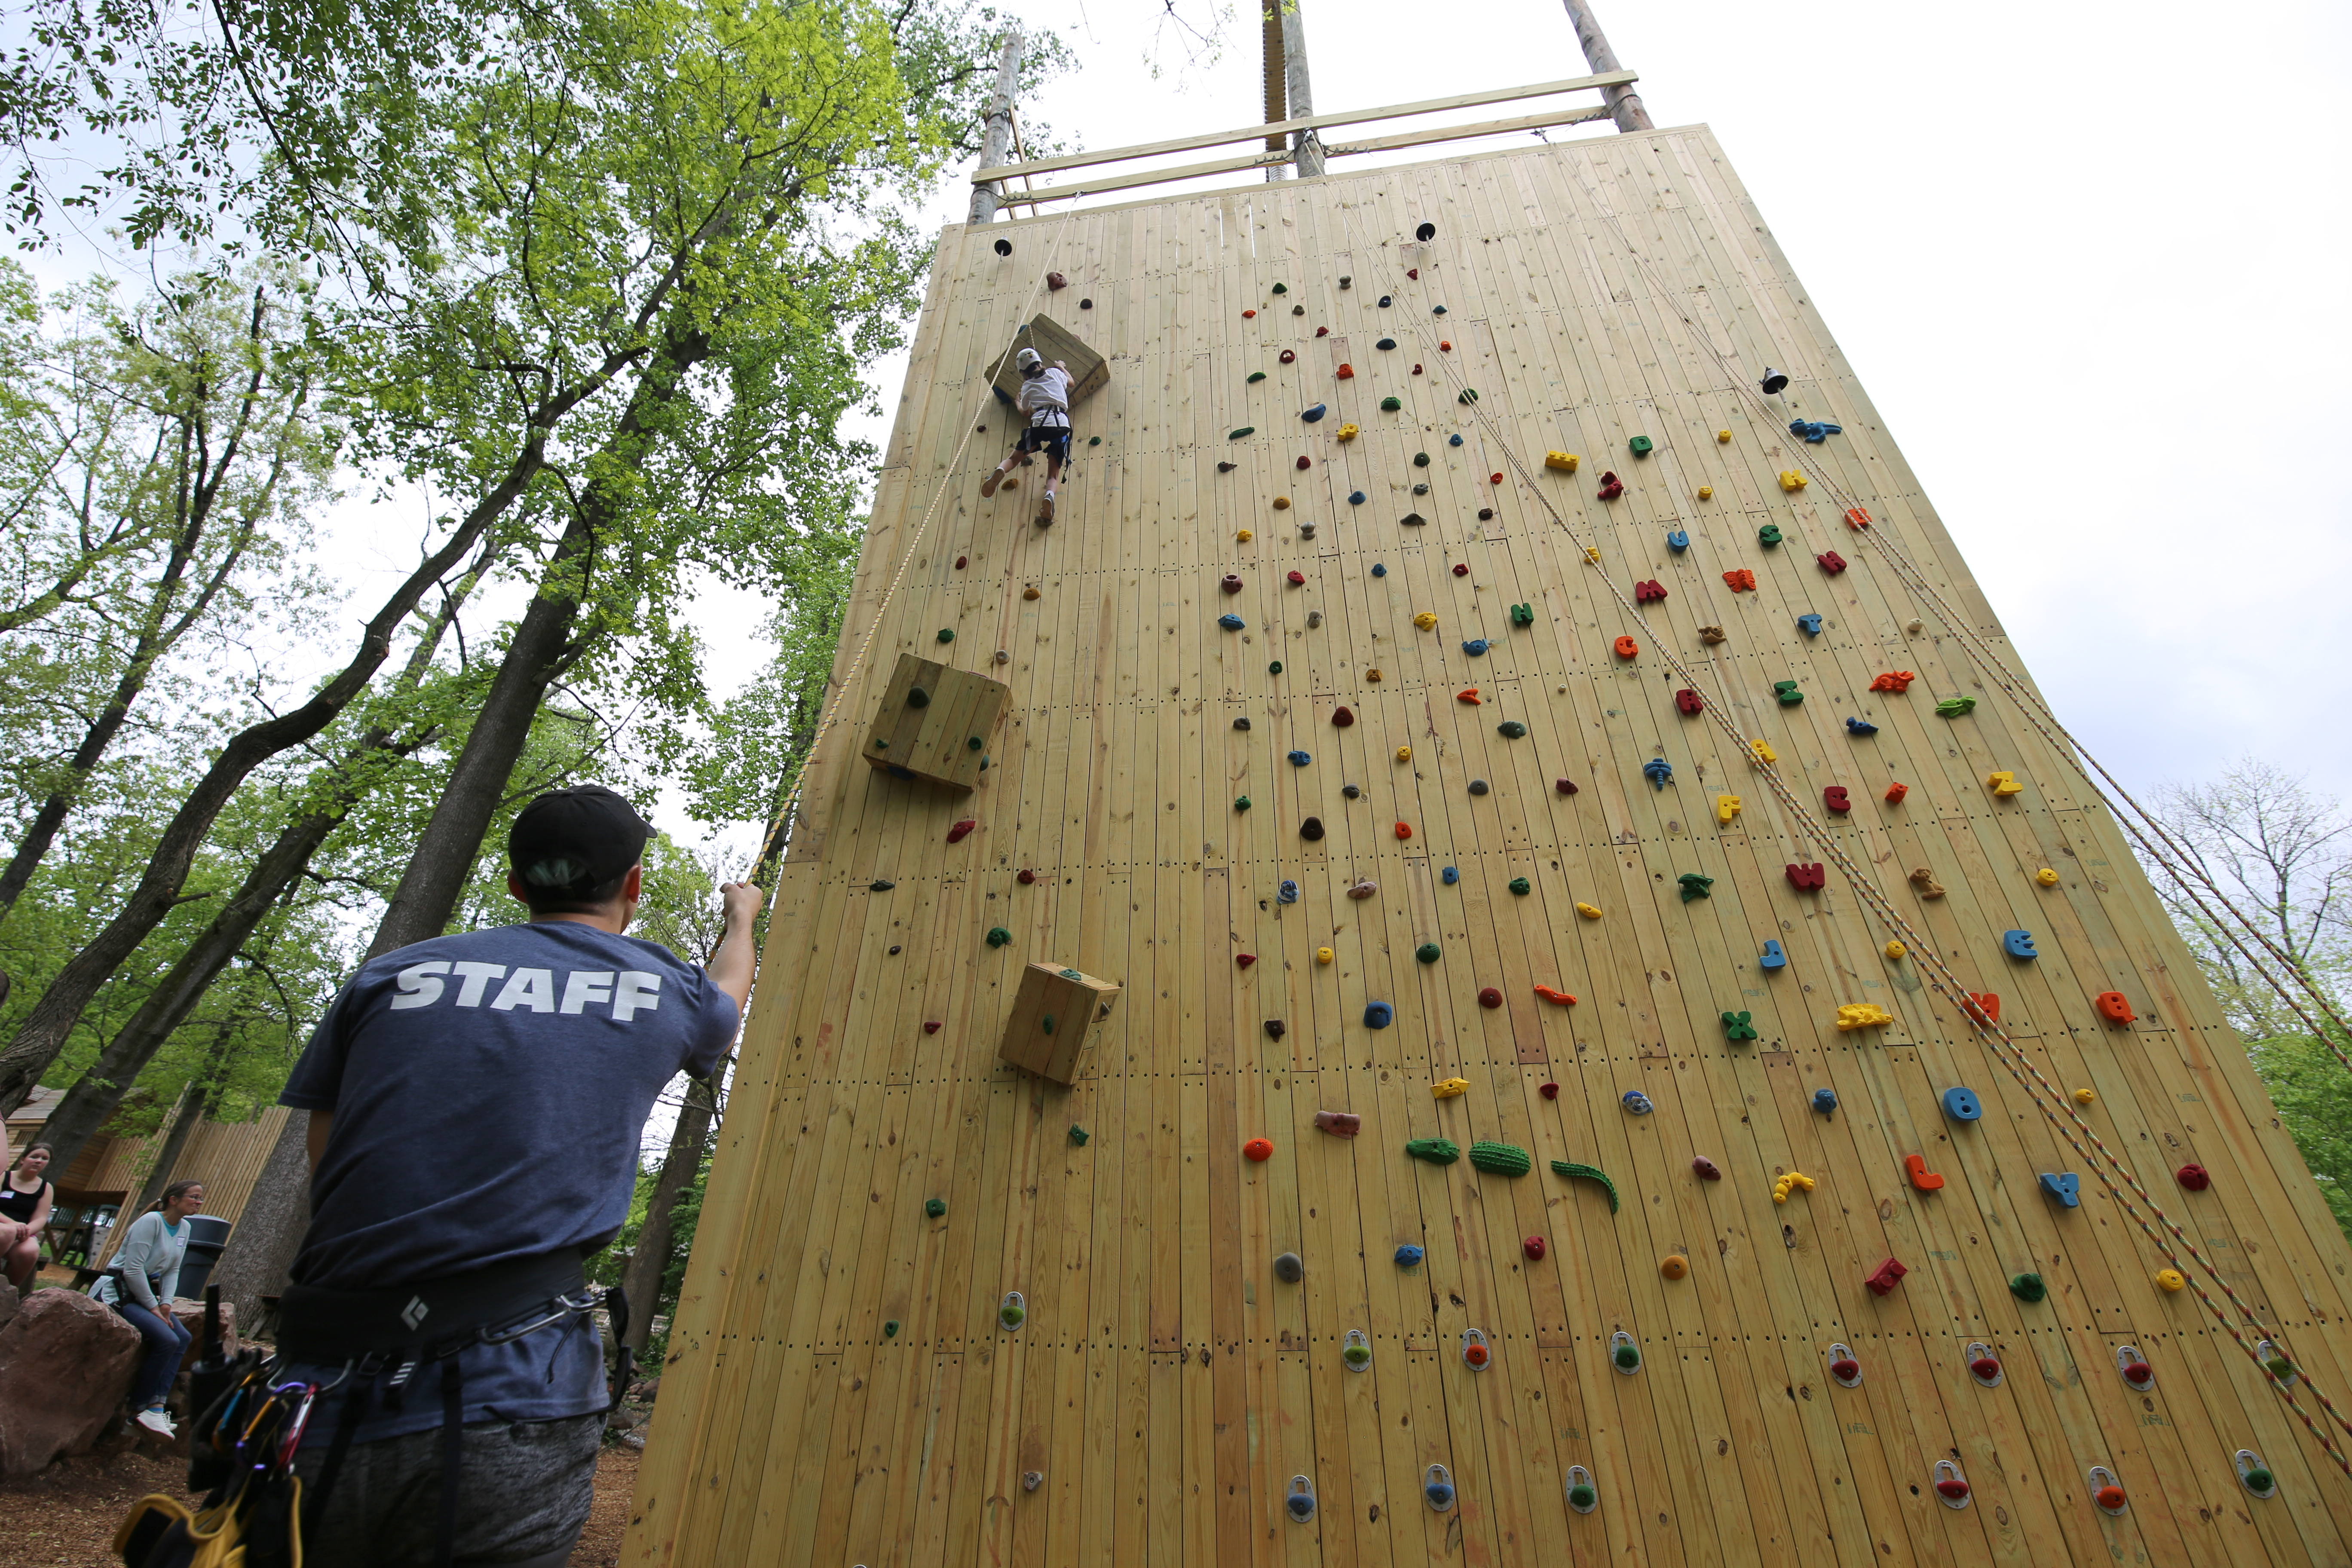 Group-Zipline-Activity-Slider